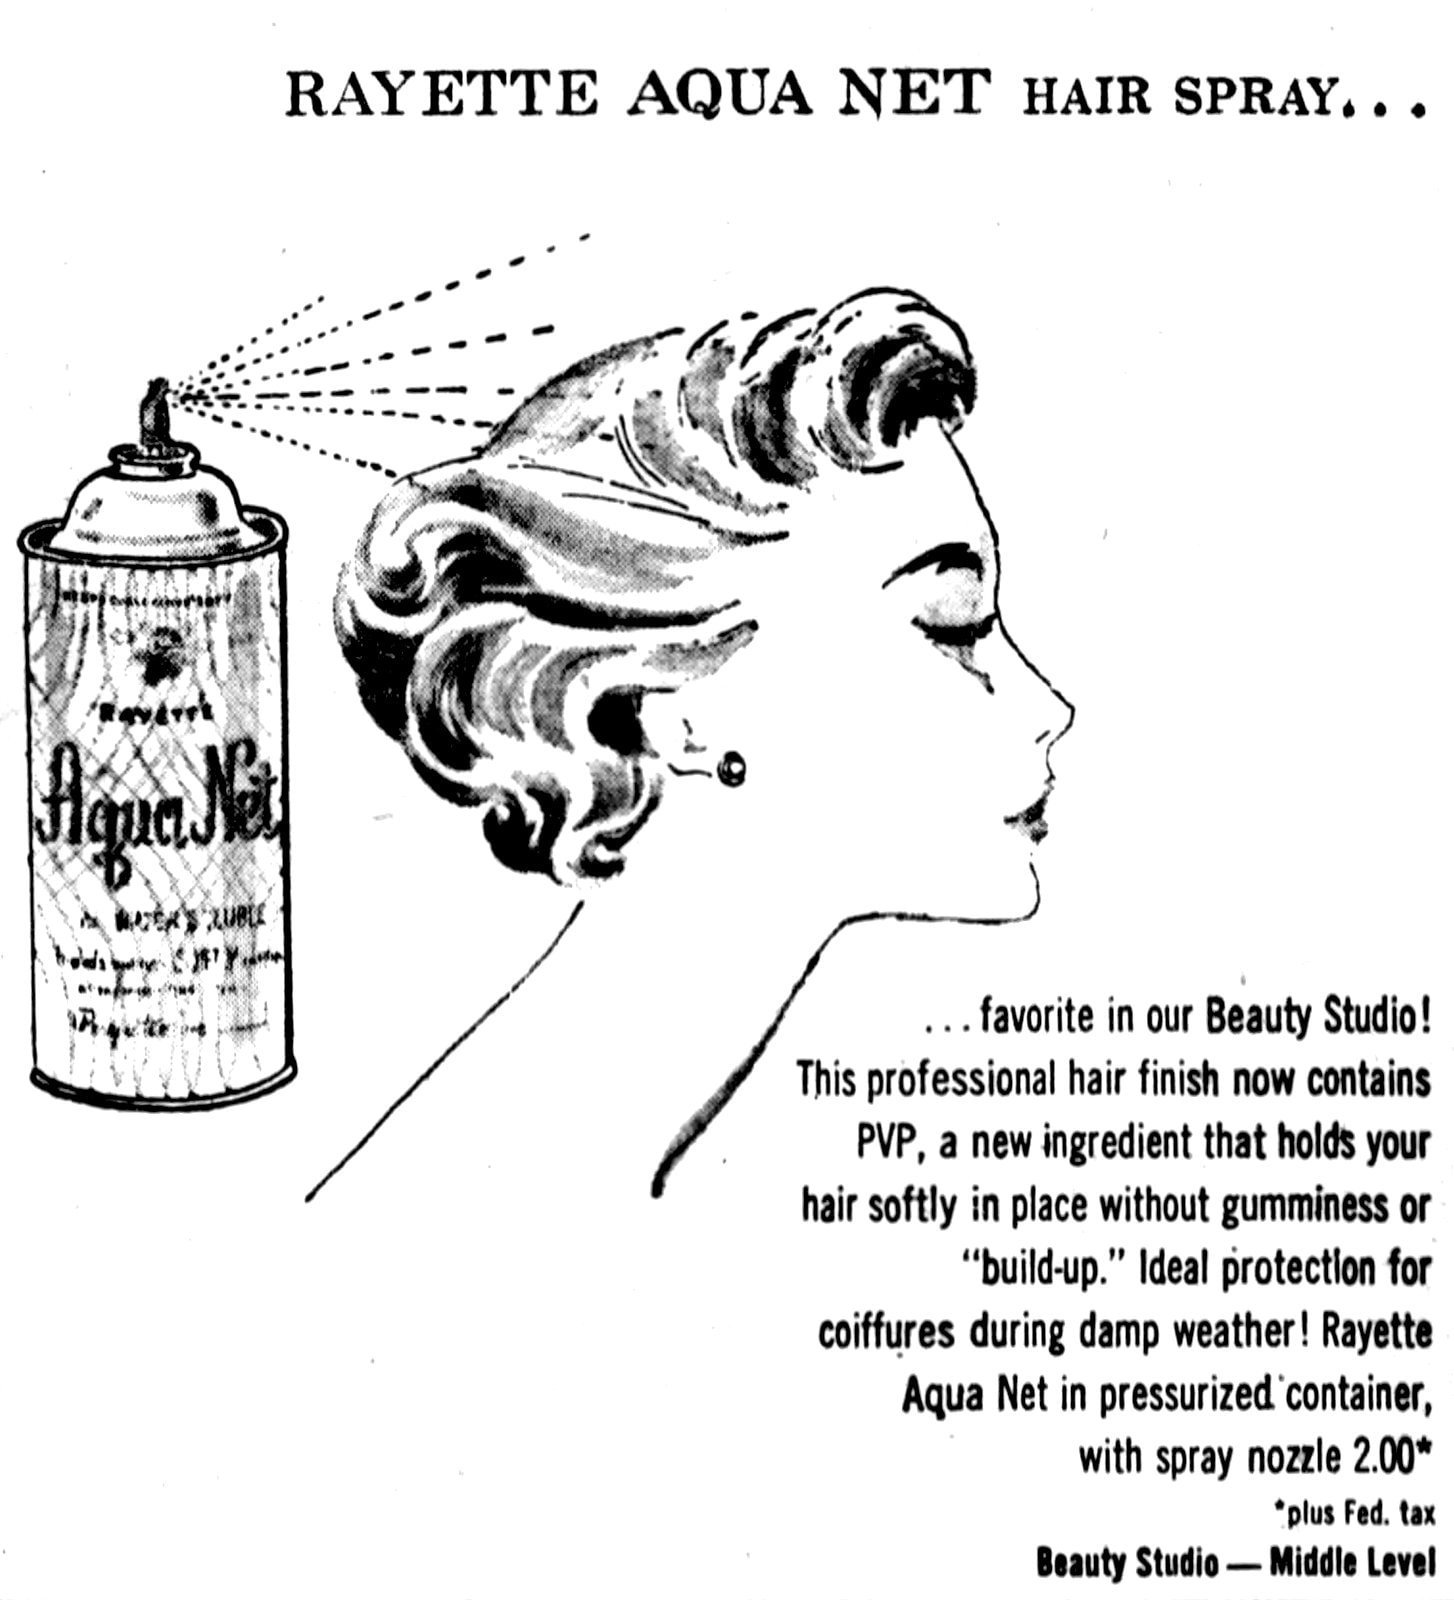 Rayette Aqua Net hair spray (1956)